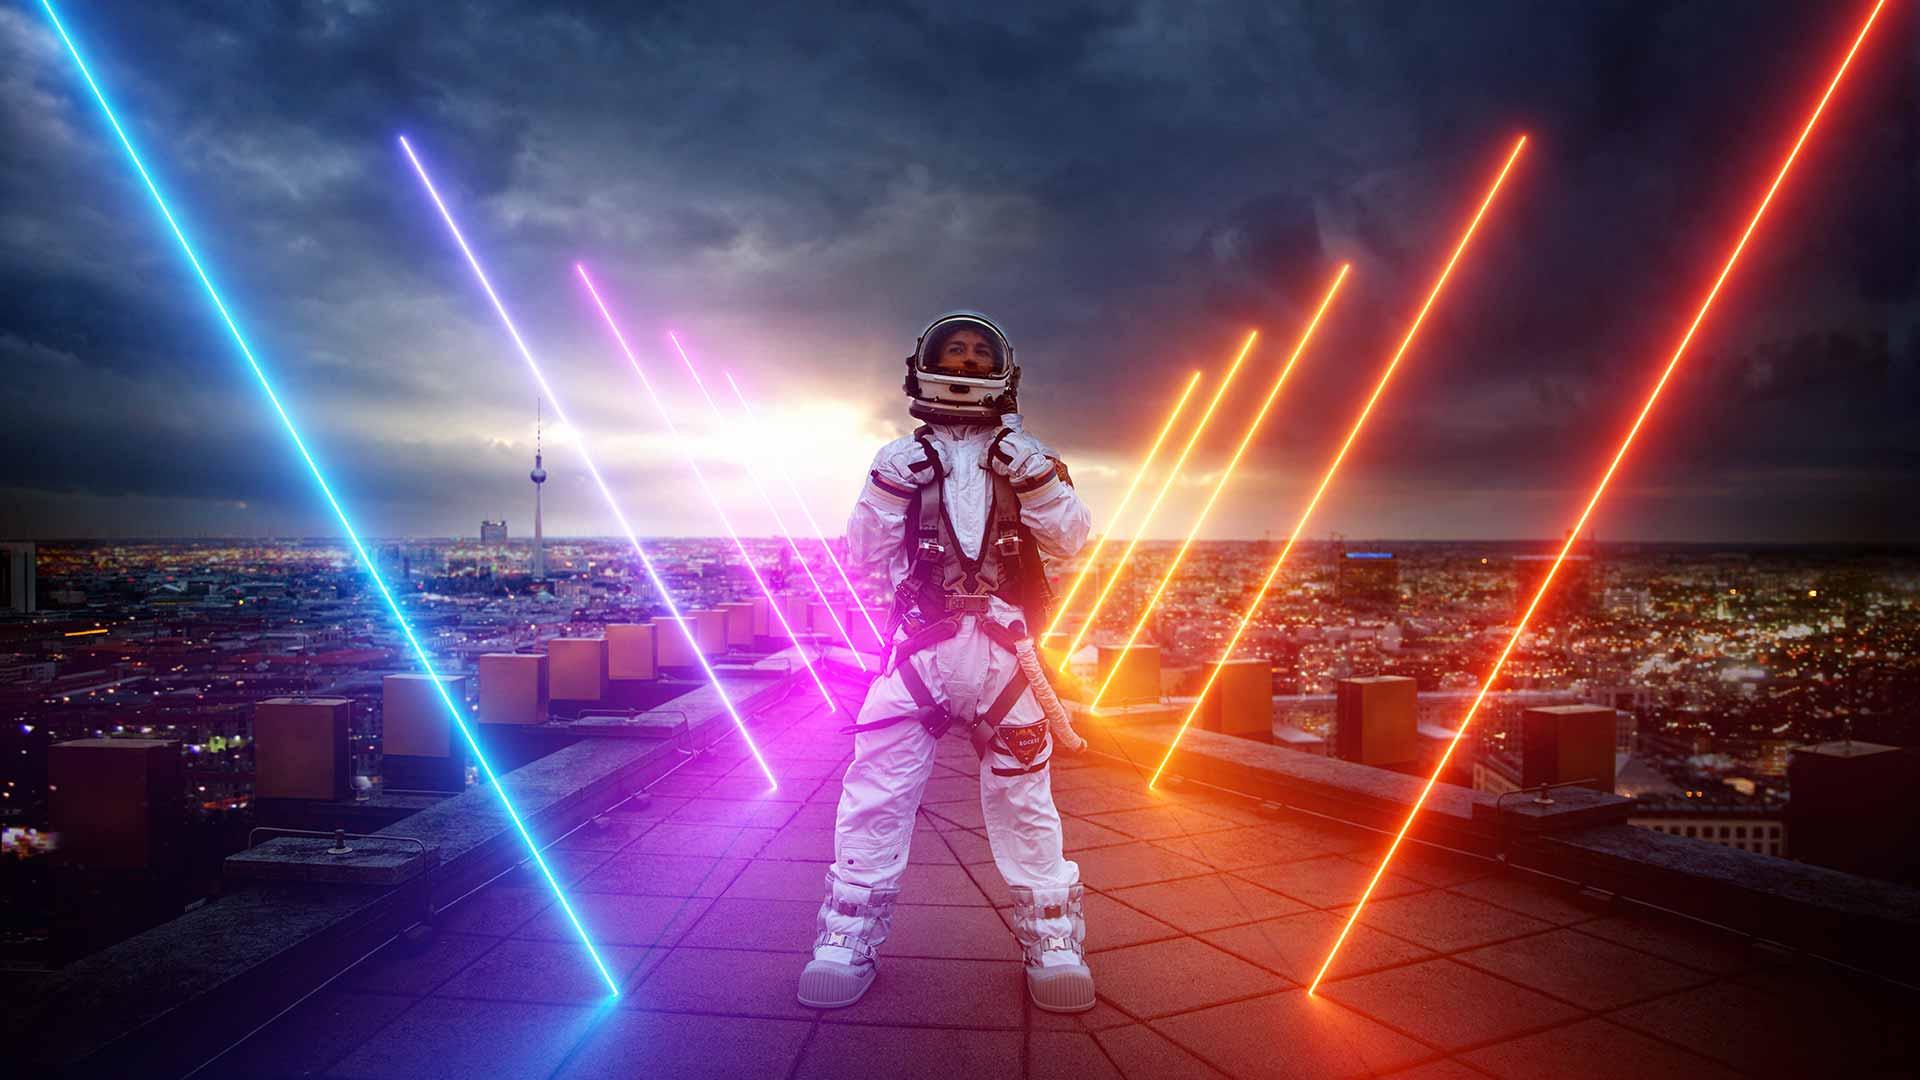 Astronaut über Dächer Berlins